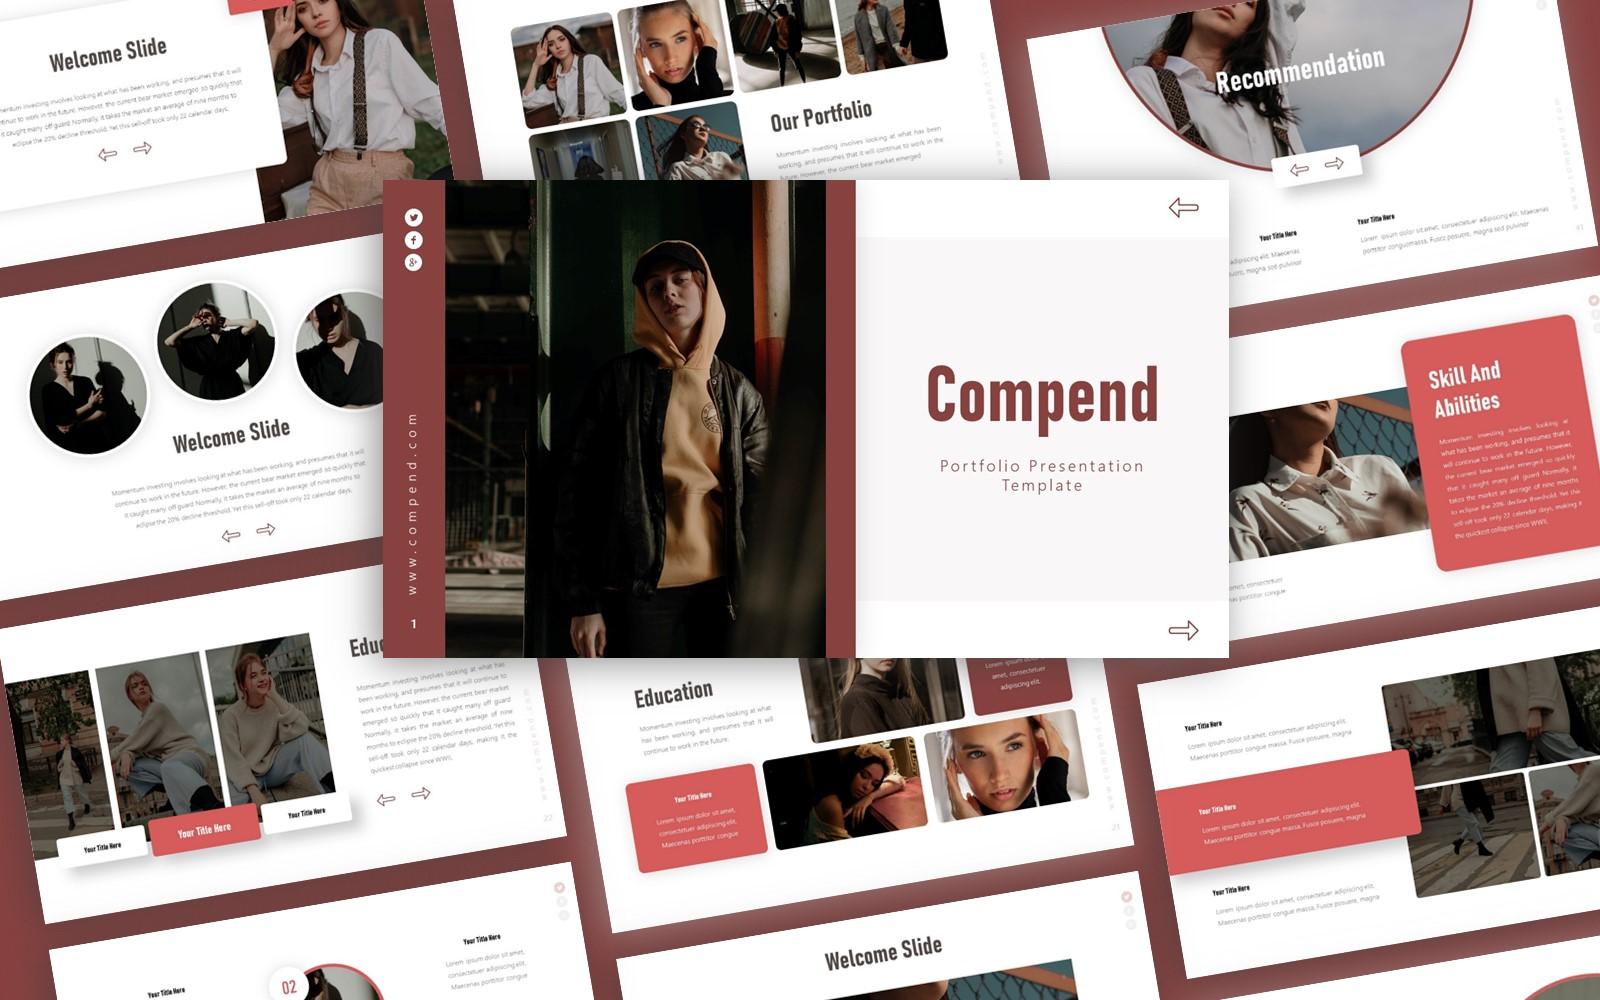 Compend Portfolio Presentation PowerPoint template